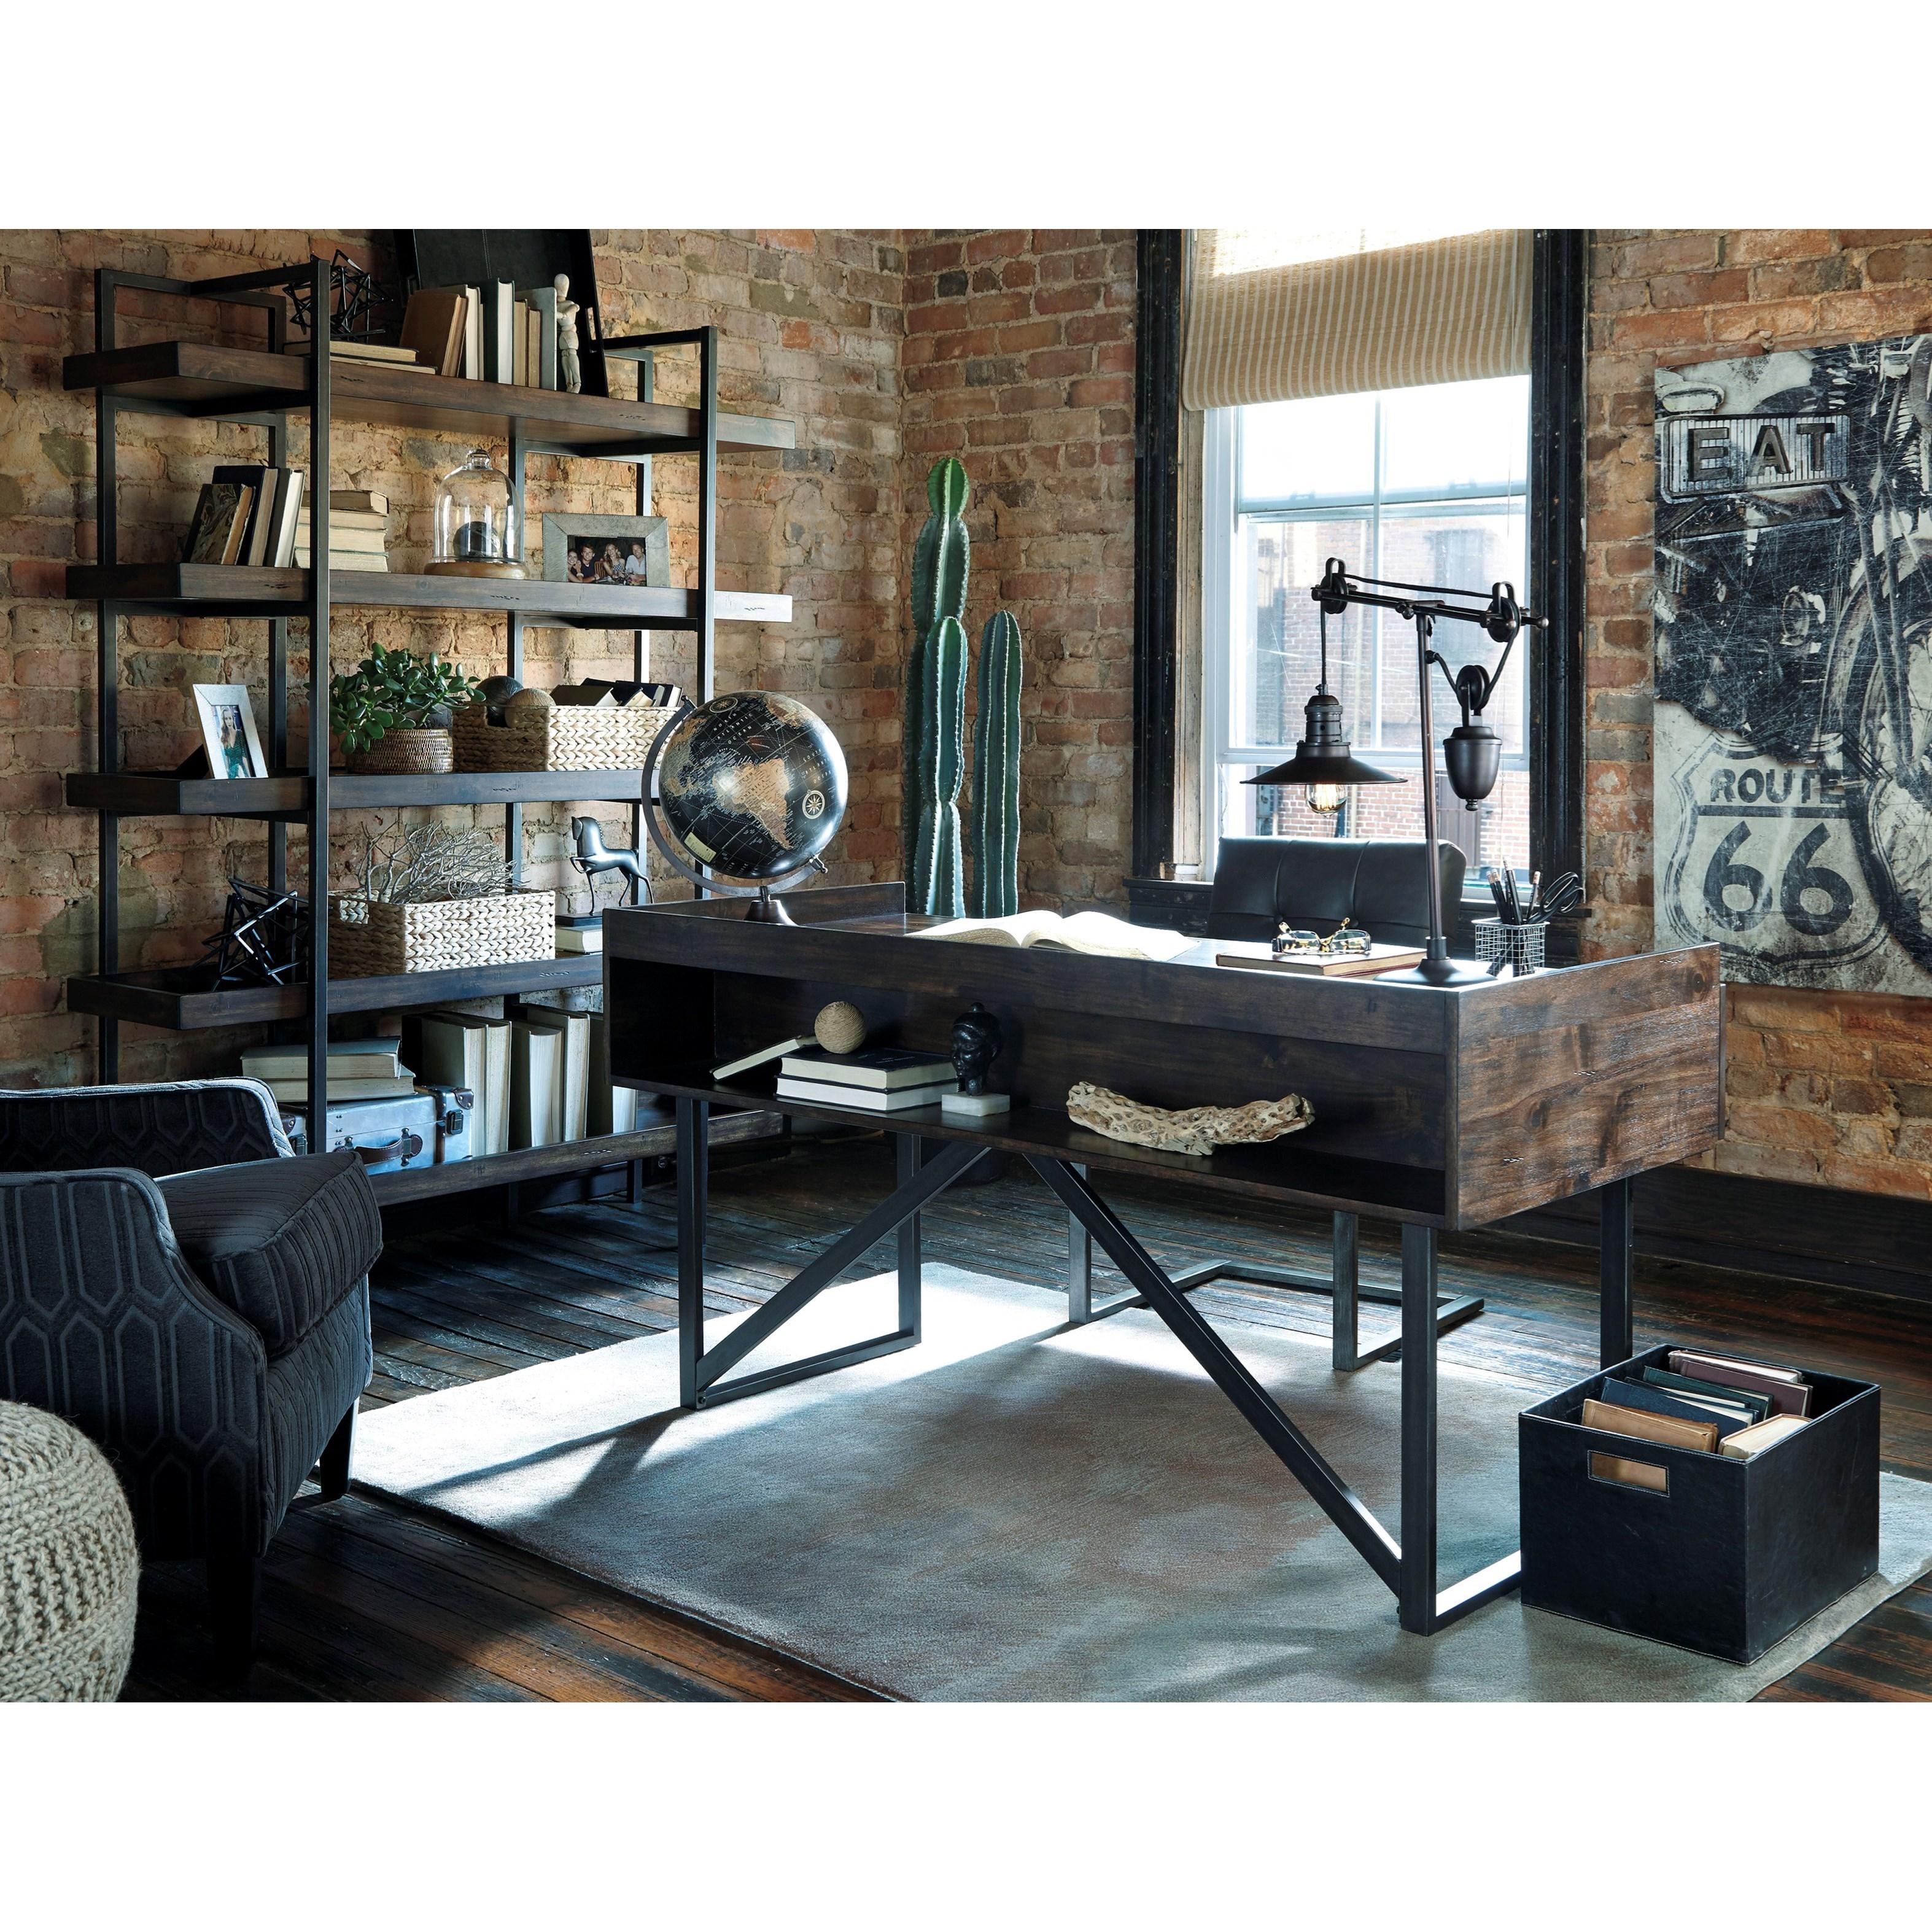 Signature Design By Ashley Starmore H633 70 Modern Rustic